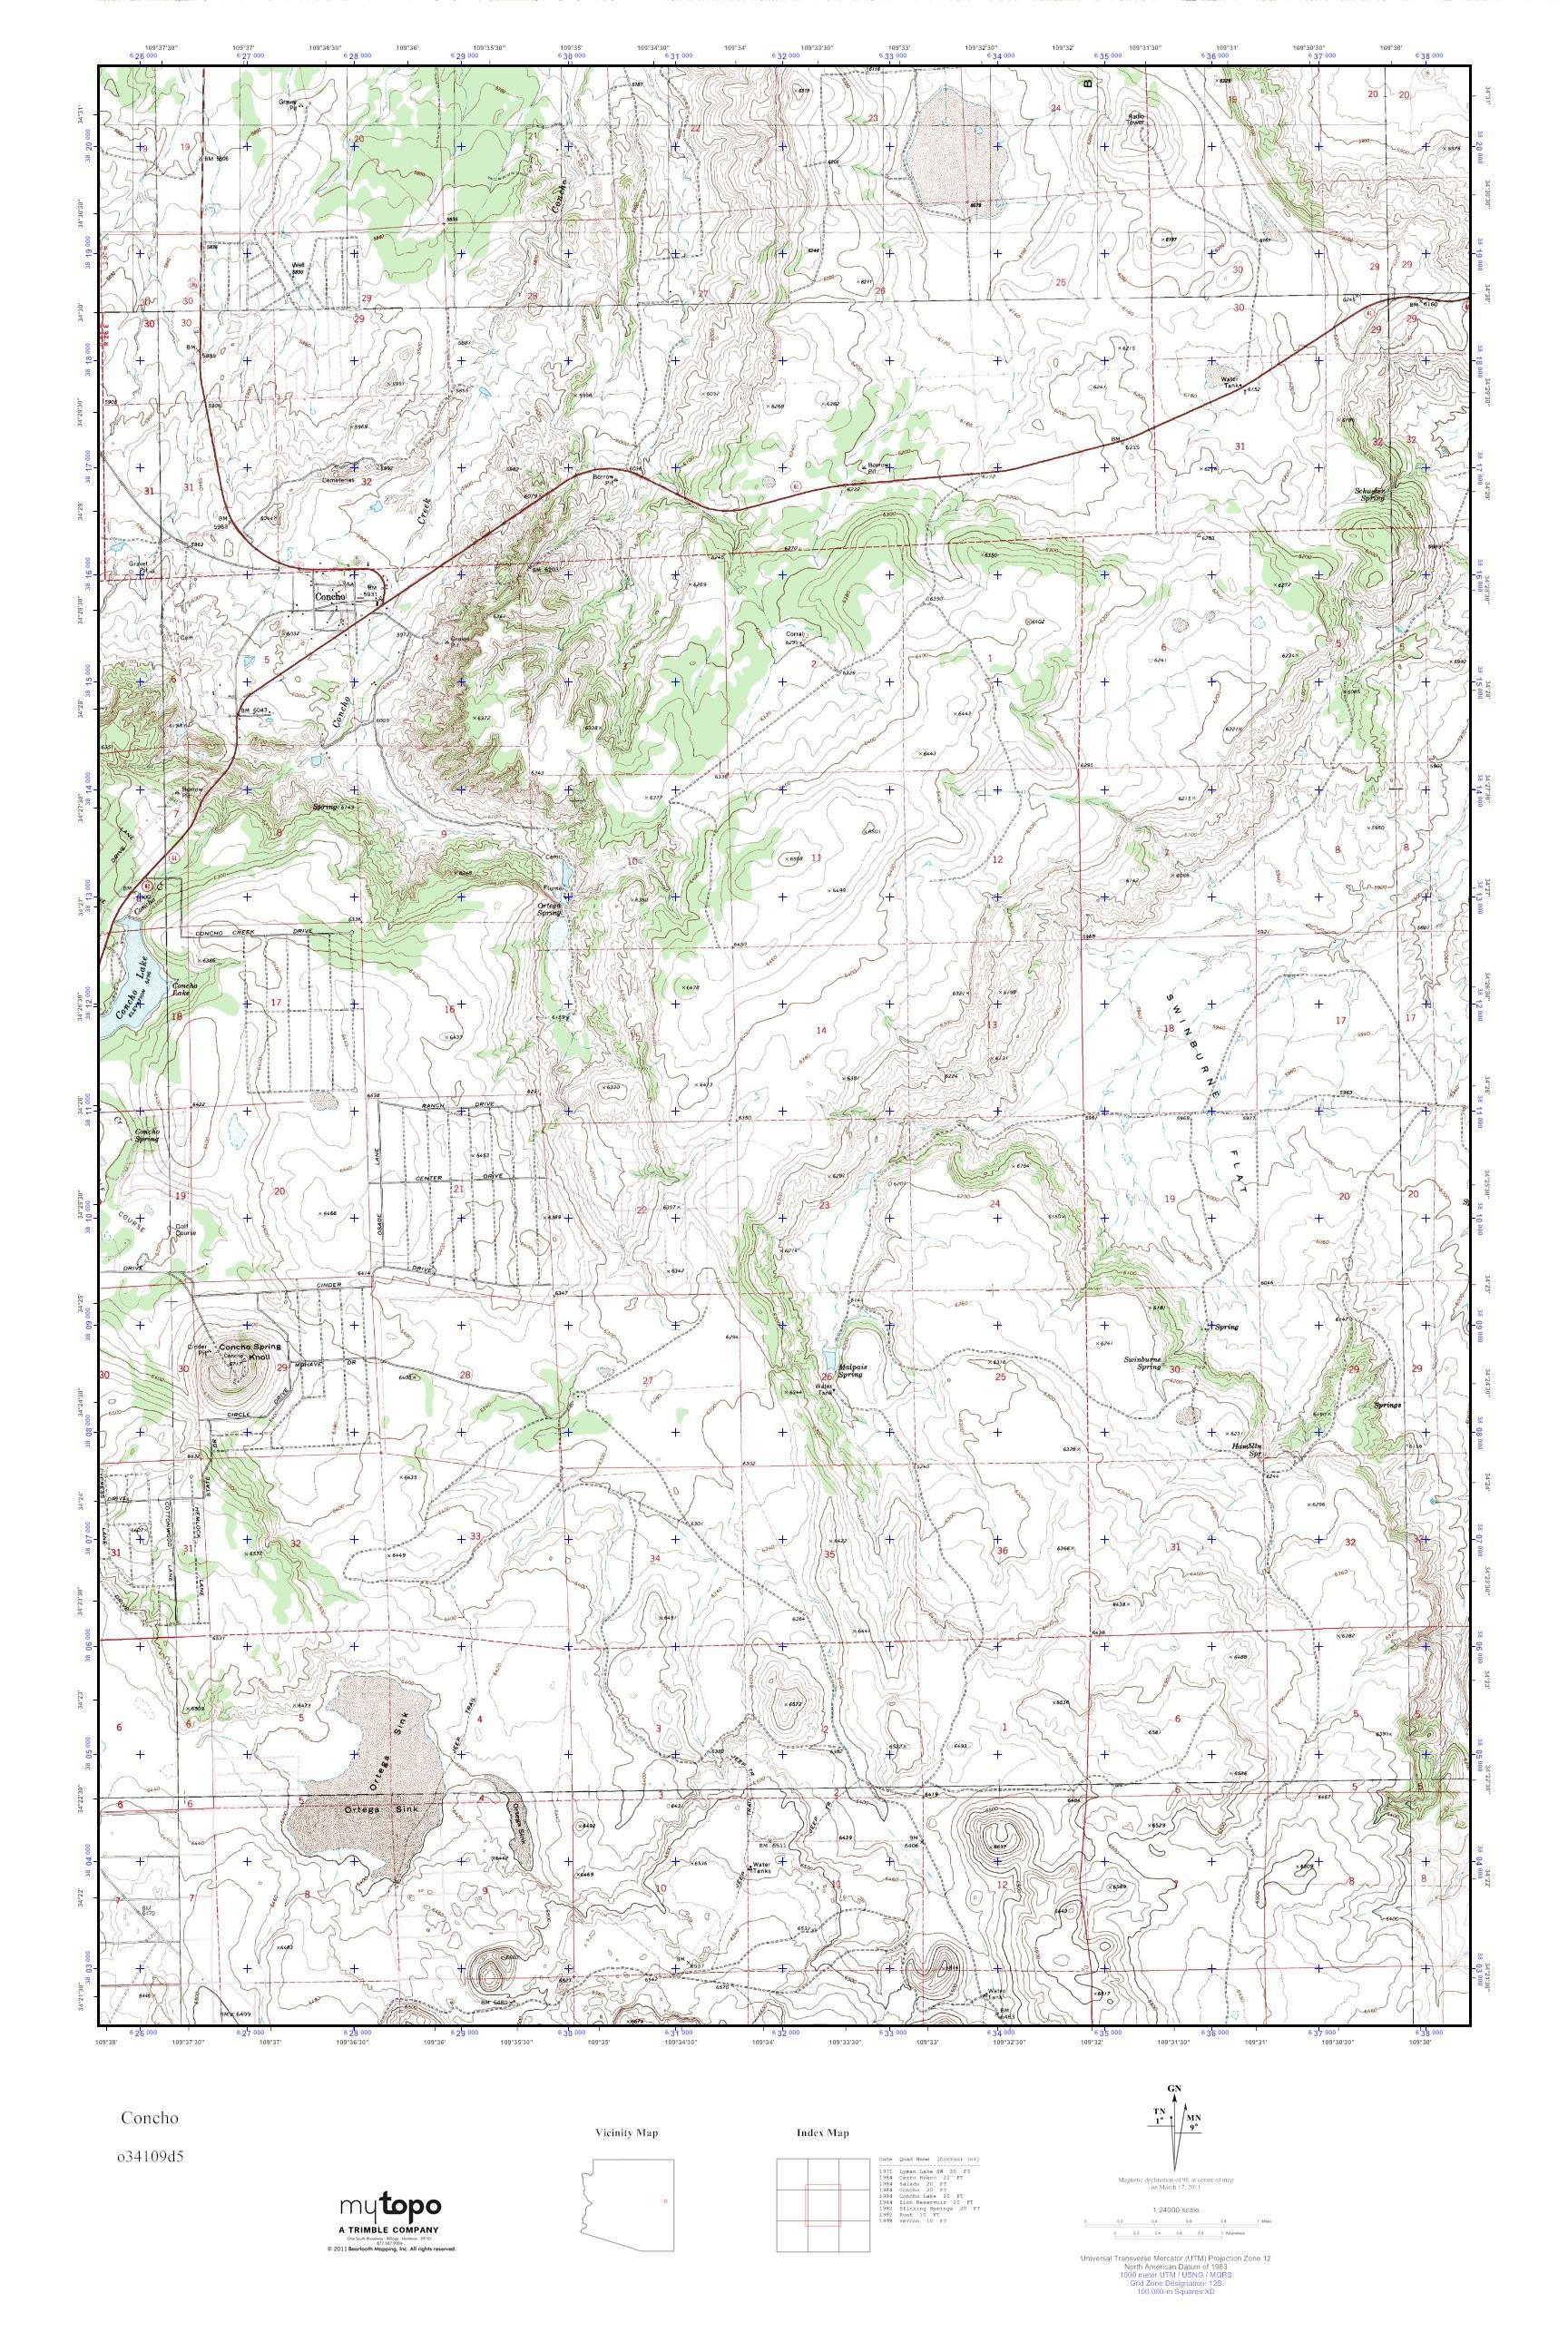 Concho Arizona Map.Mytopo Concho Arizona Usgs Quad Topo Map